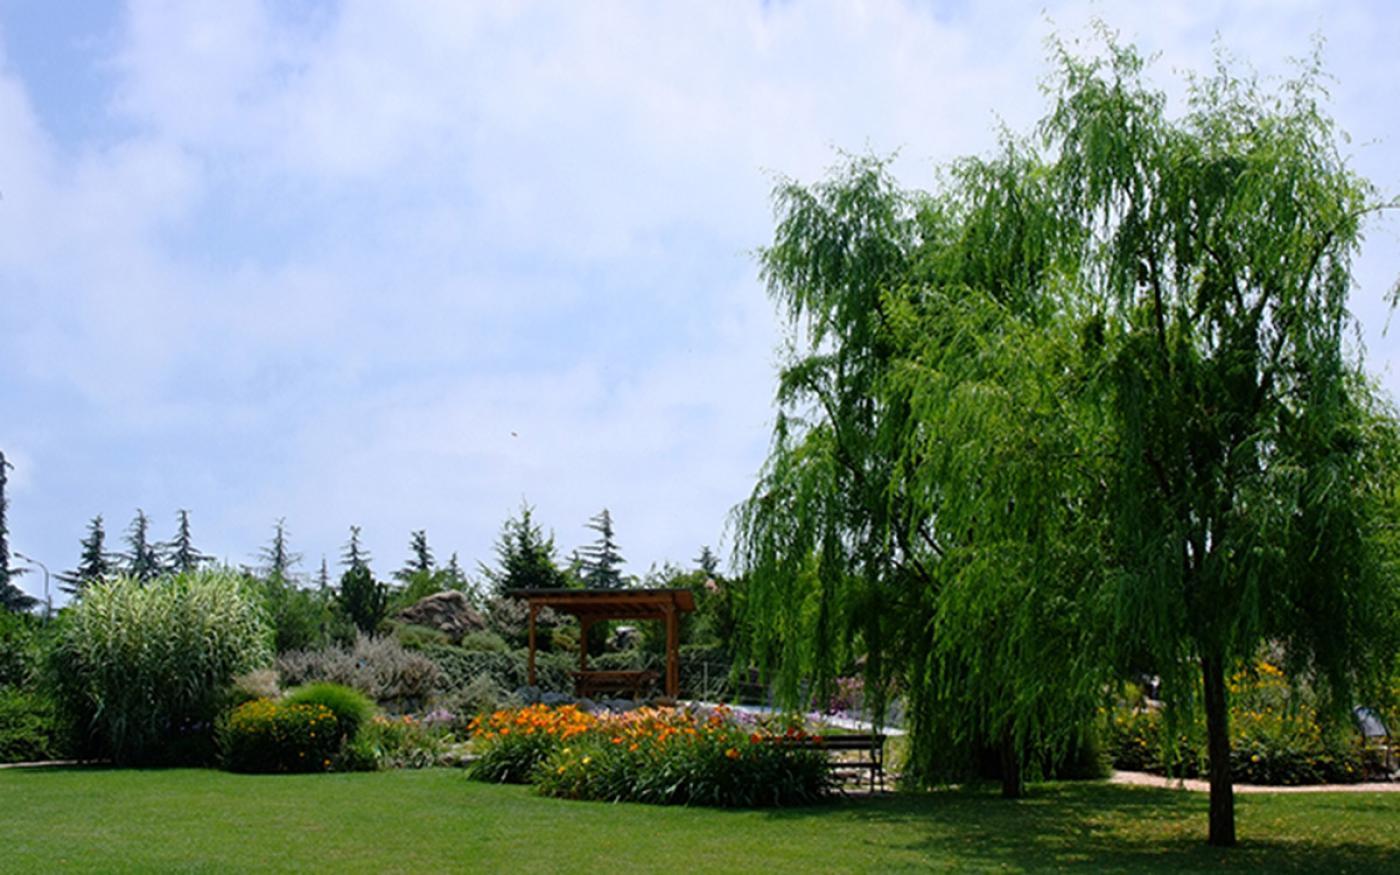 Giardino giardino del mandarino yu with giardino giardini landscape garden design giardino in - Giardino del mandarino yu ...